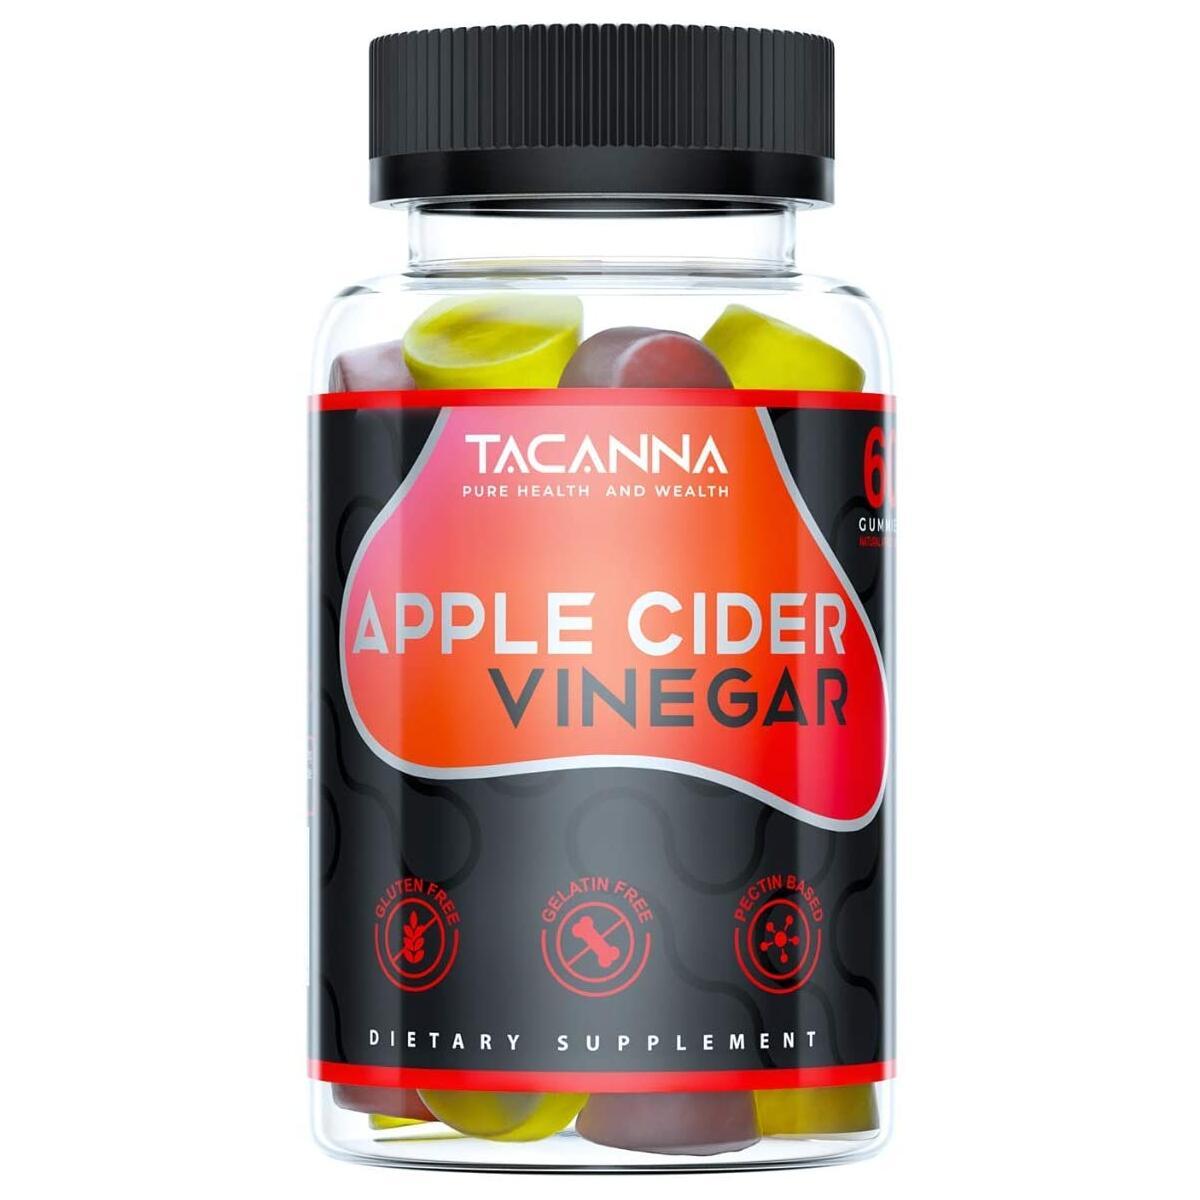 Tacanna Apple Cider Vinegar Gummies All-Natural - 60 Count, Gluten-Free, Non-GMO - Immunity, Weight, Gentle Colon Cleanse Women, Men, and Kids Immune Support